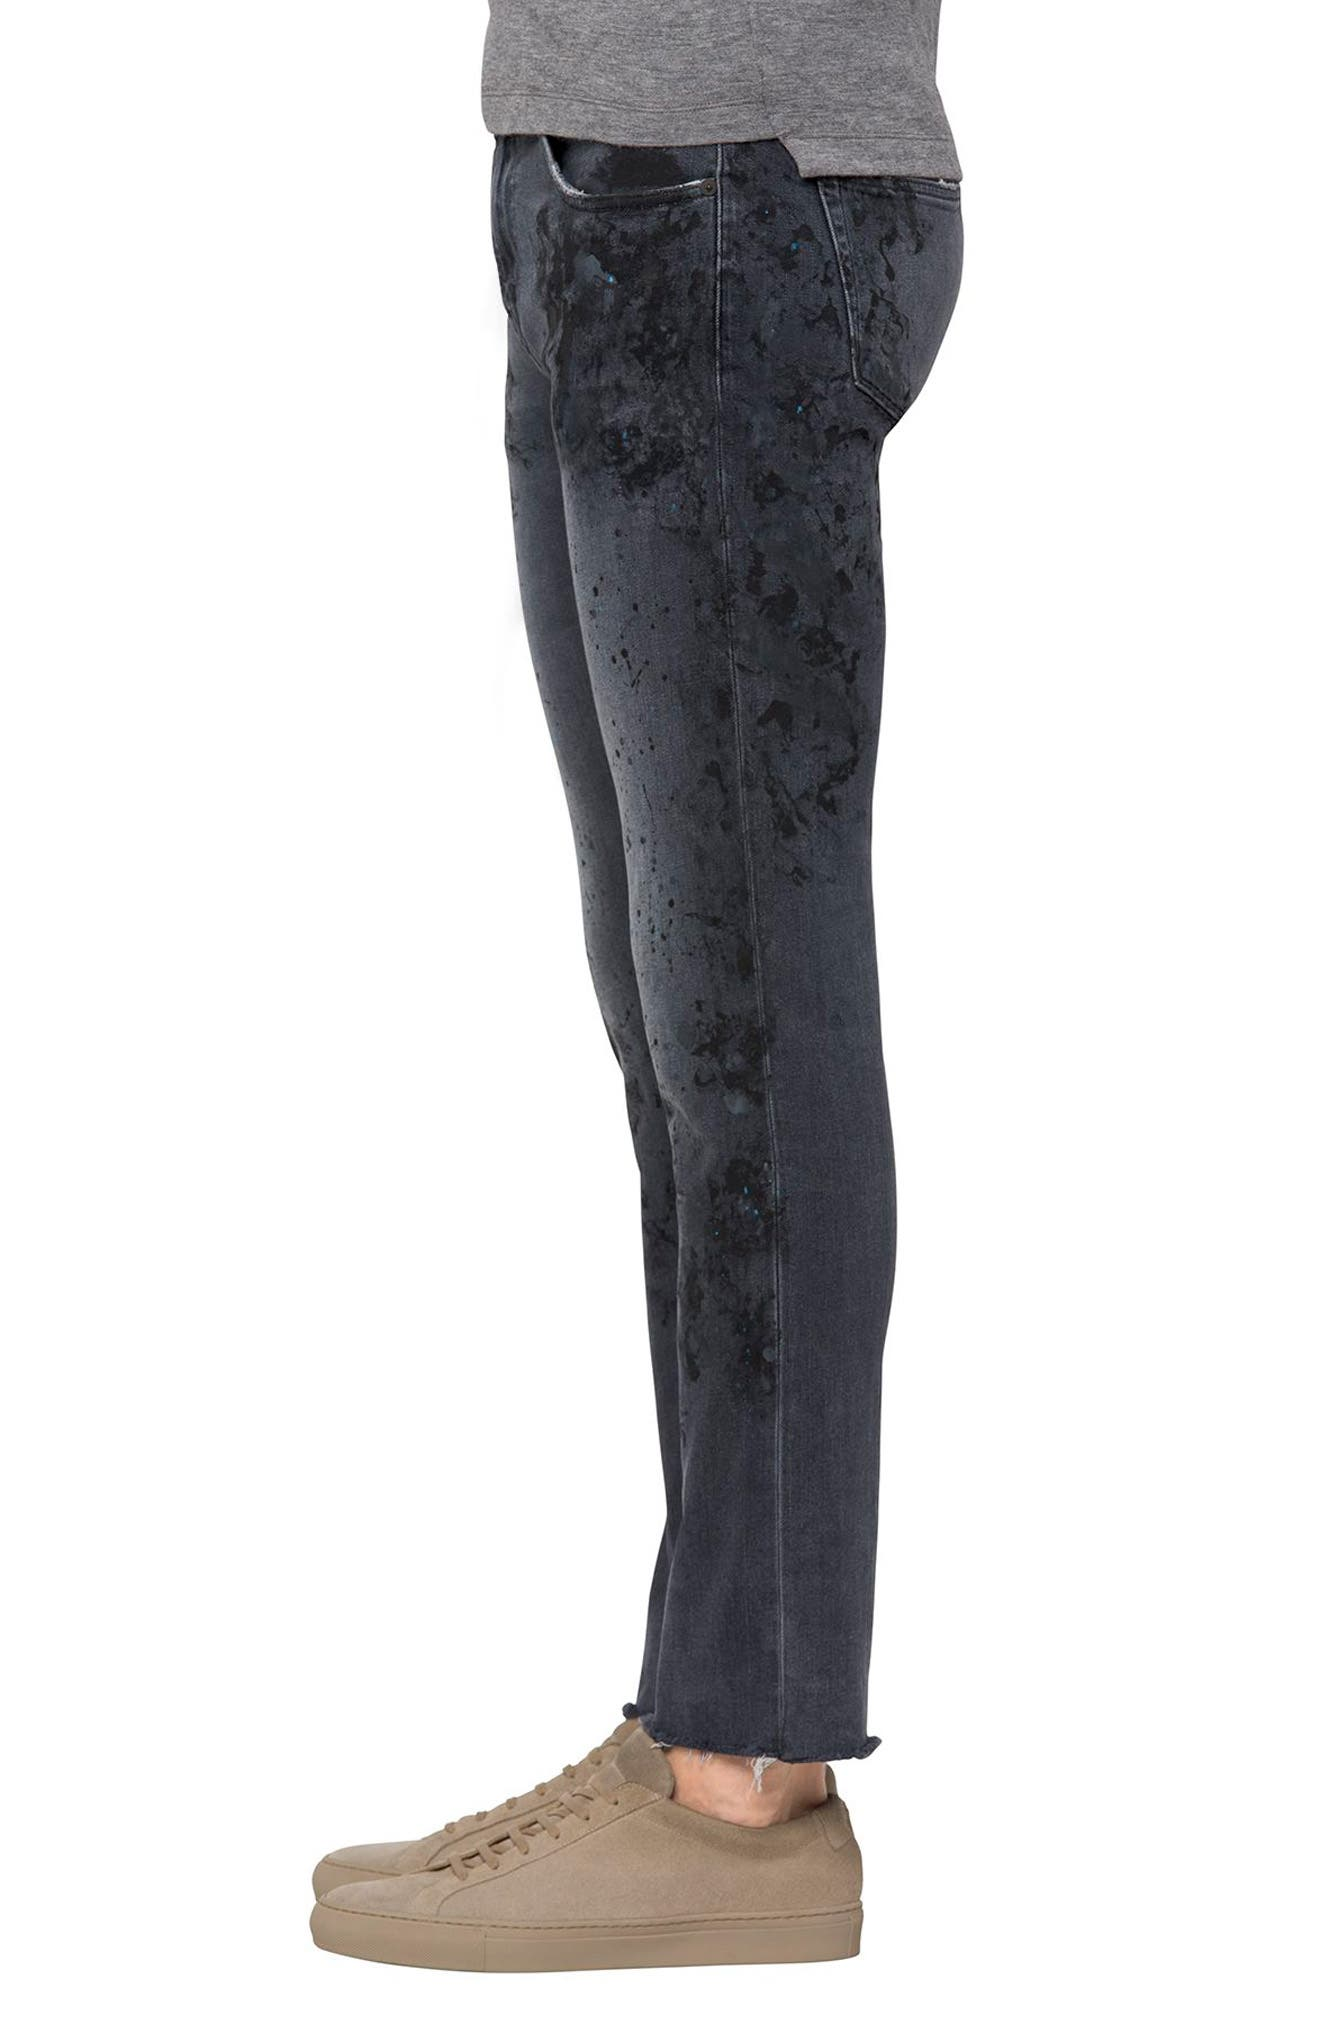 Mick Skinny Fit Jeans,                             Alternate thumbnail 3, color,                             Vitreous